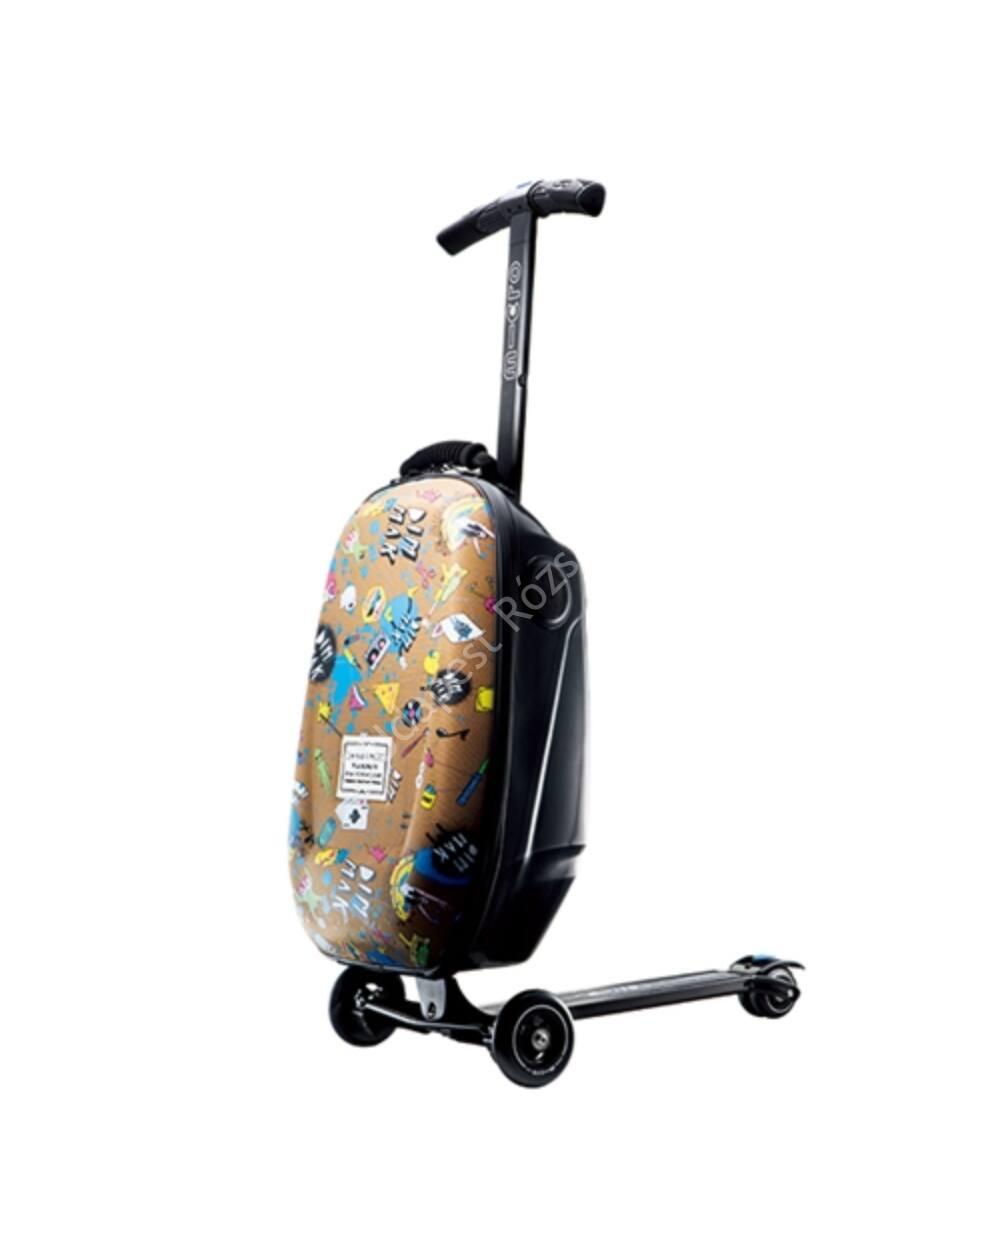 Micro Steve Aoki bőrönd roller, integrált Sound2go hangszóróval